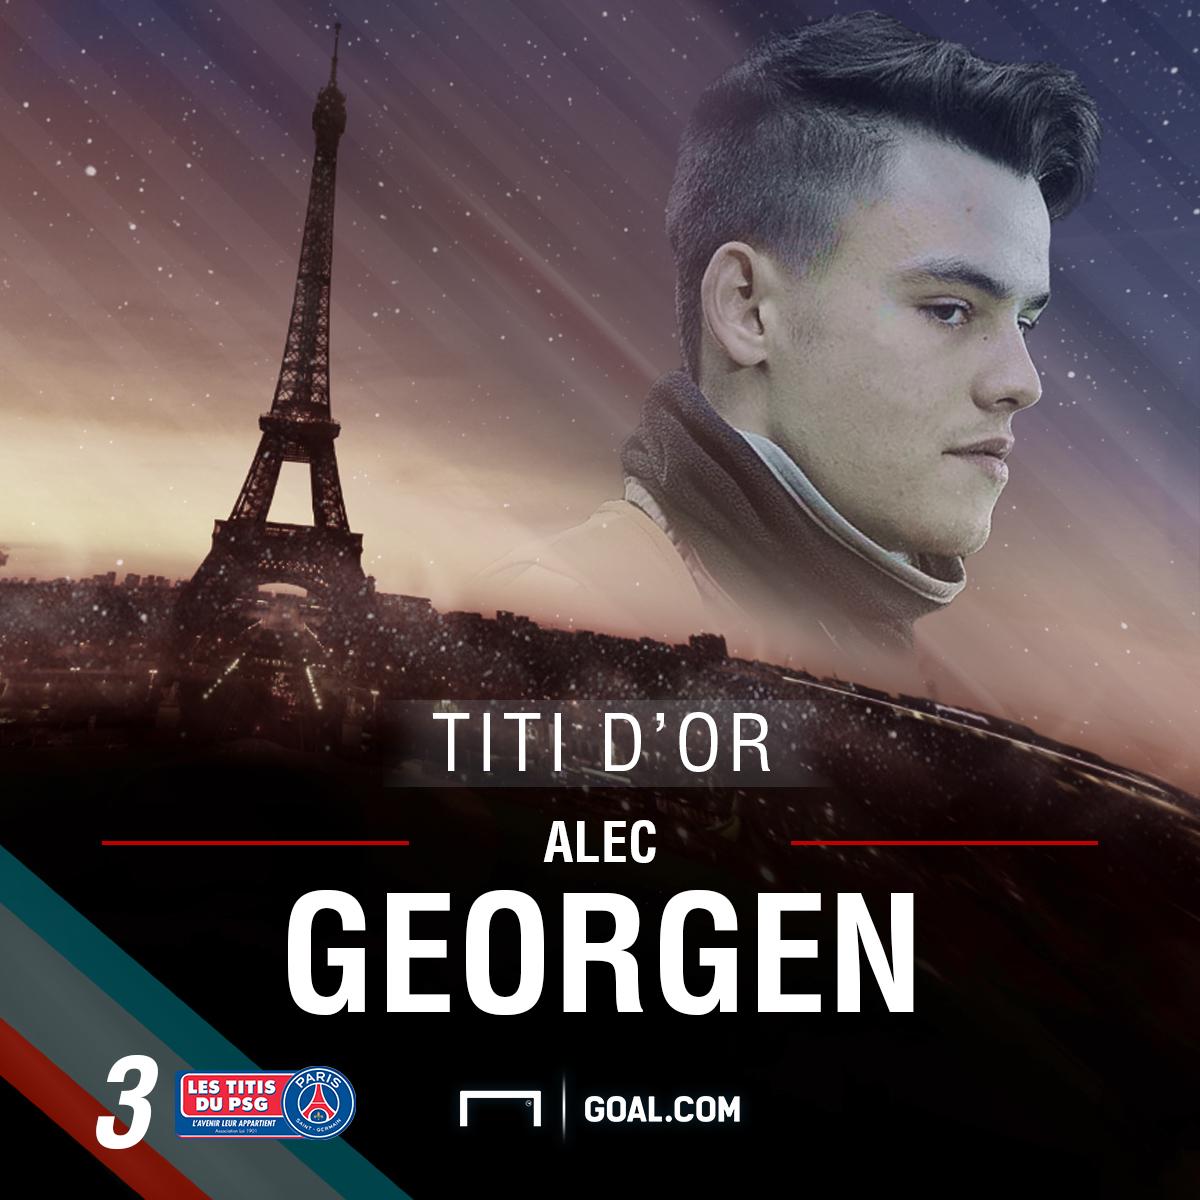 Alec Georgen - PSG